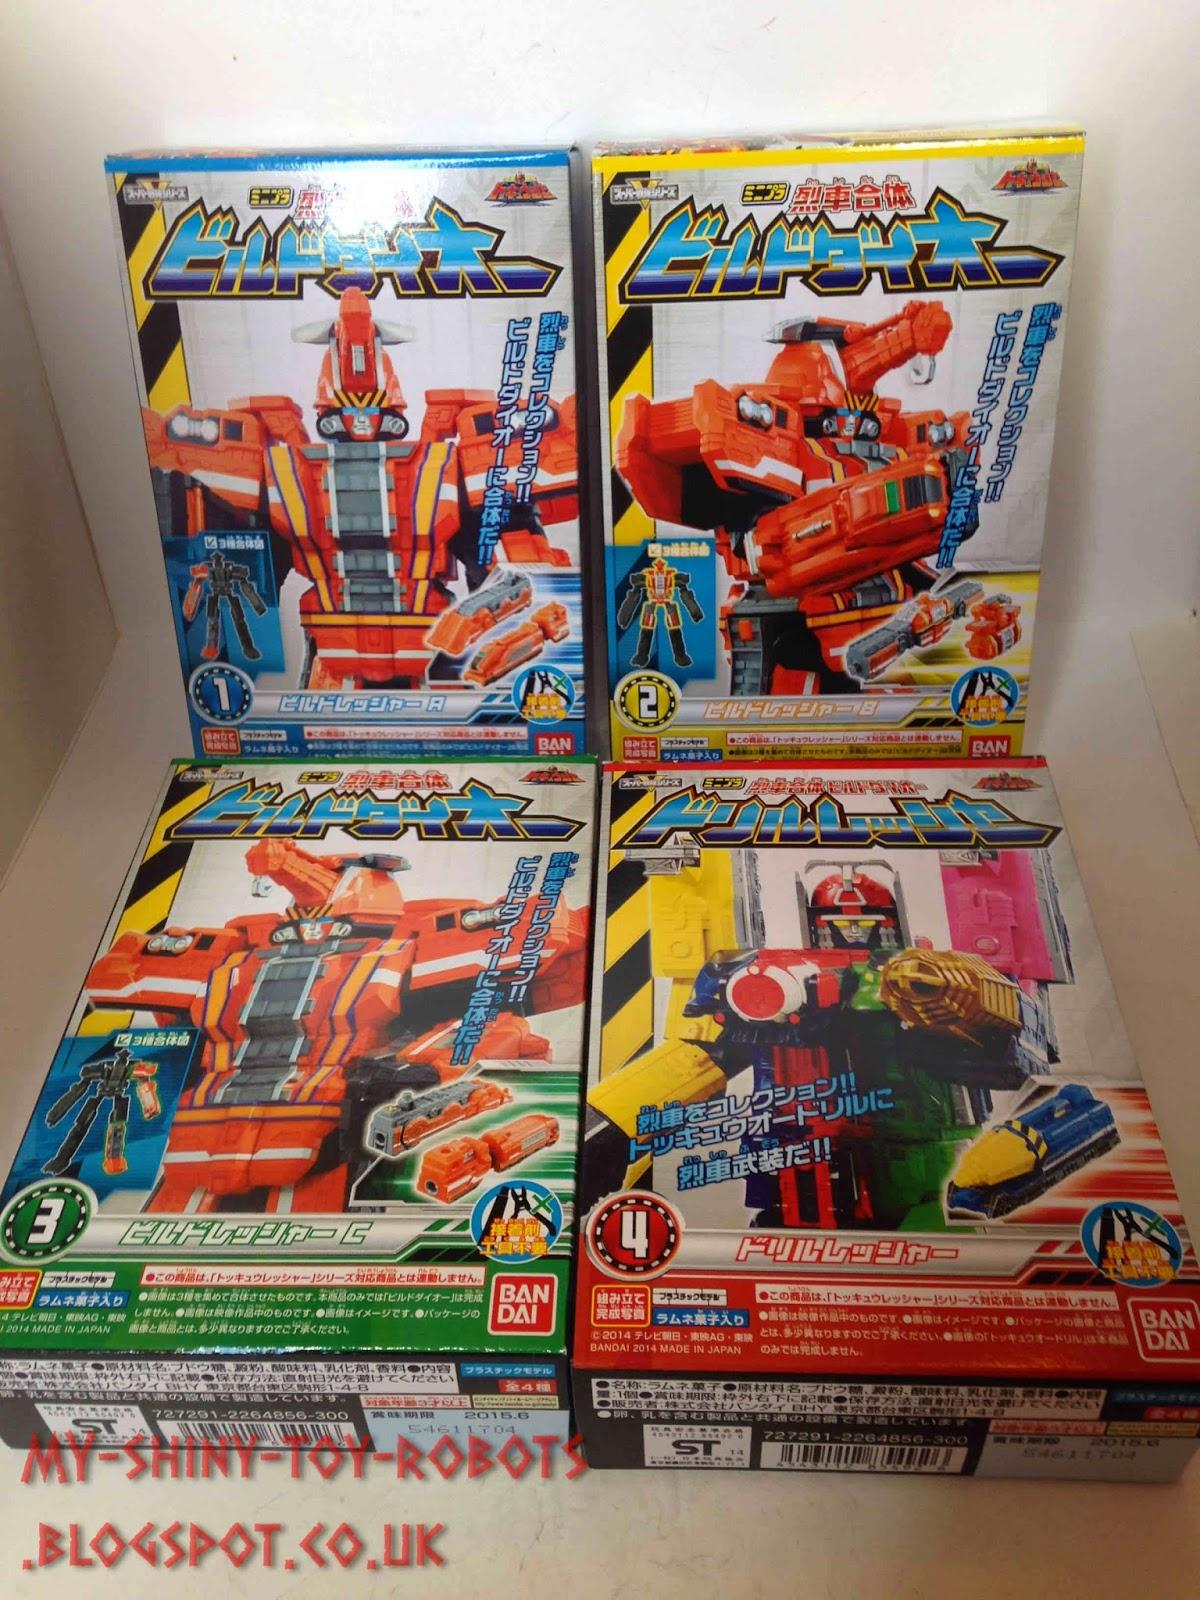 Four brand new boxes of joy